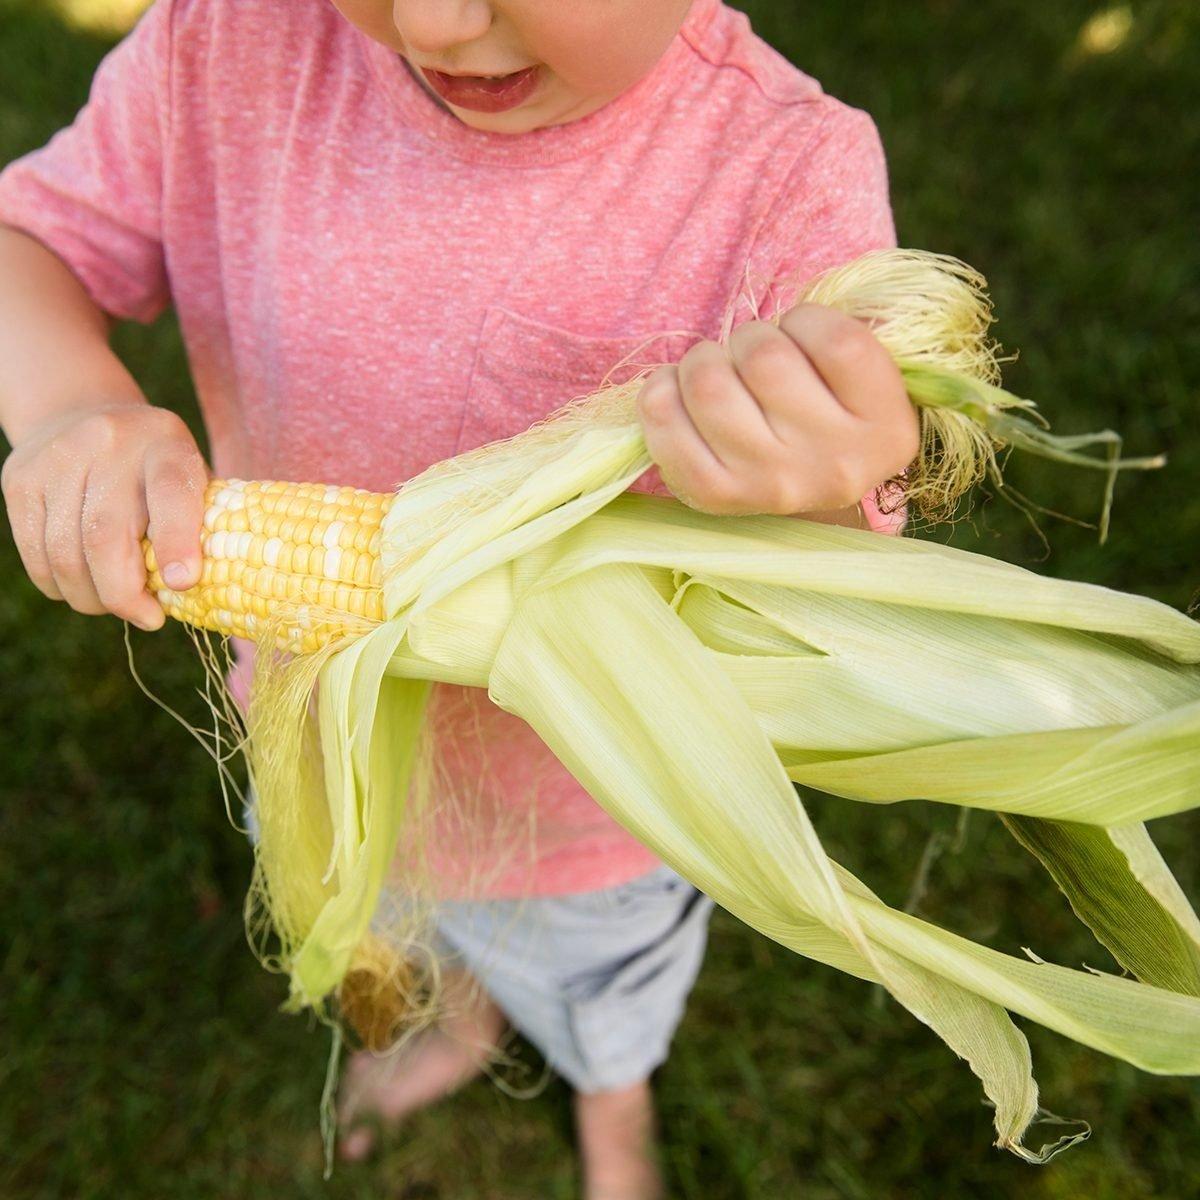 Boy (4-5) peeling corn cob